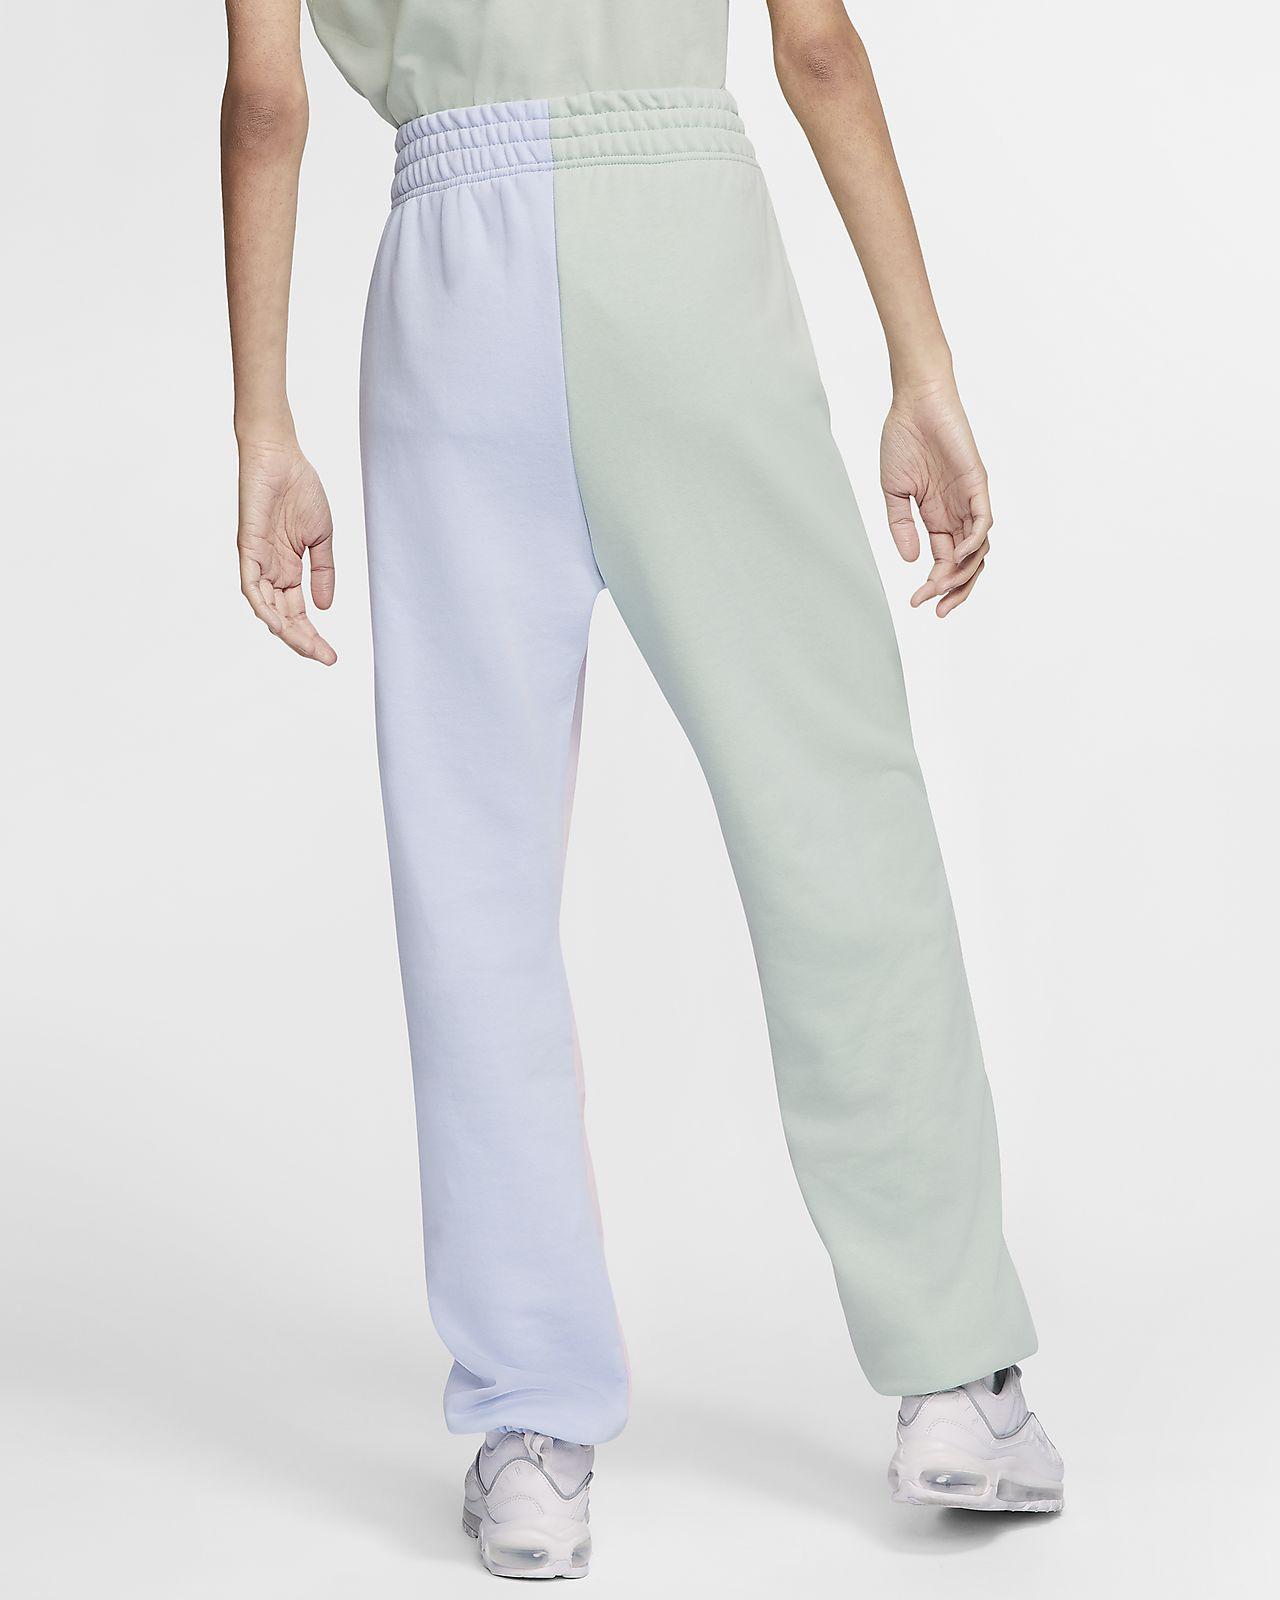 pantalon nike femme bleu